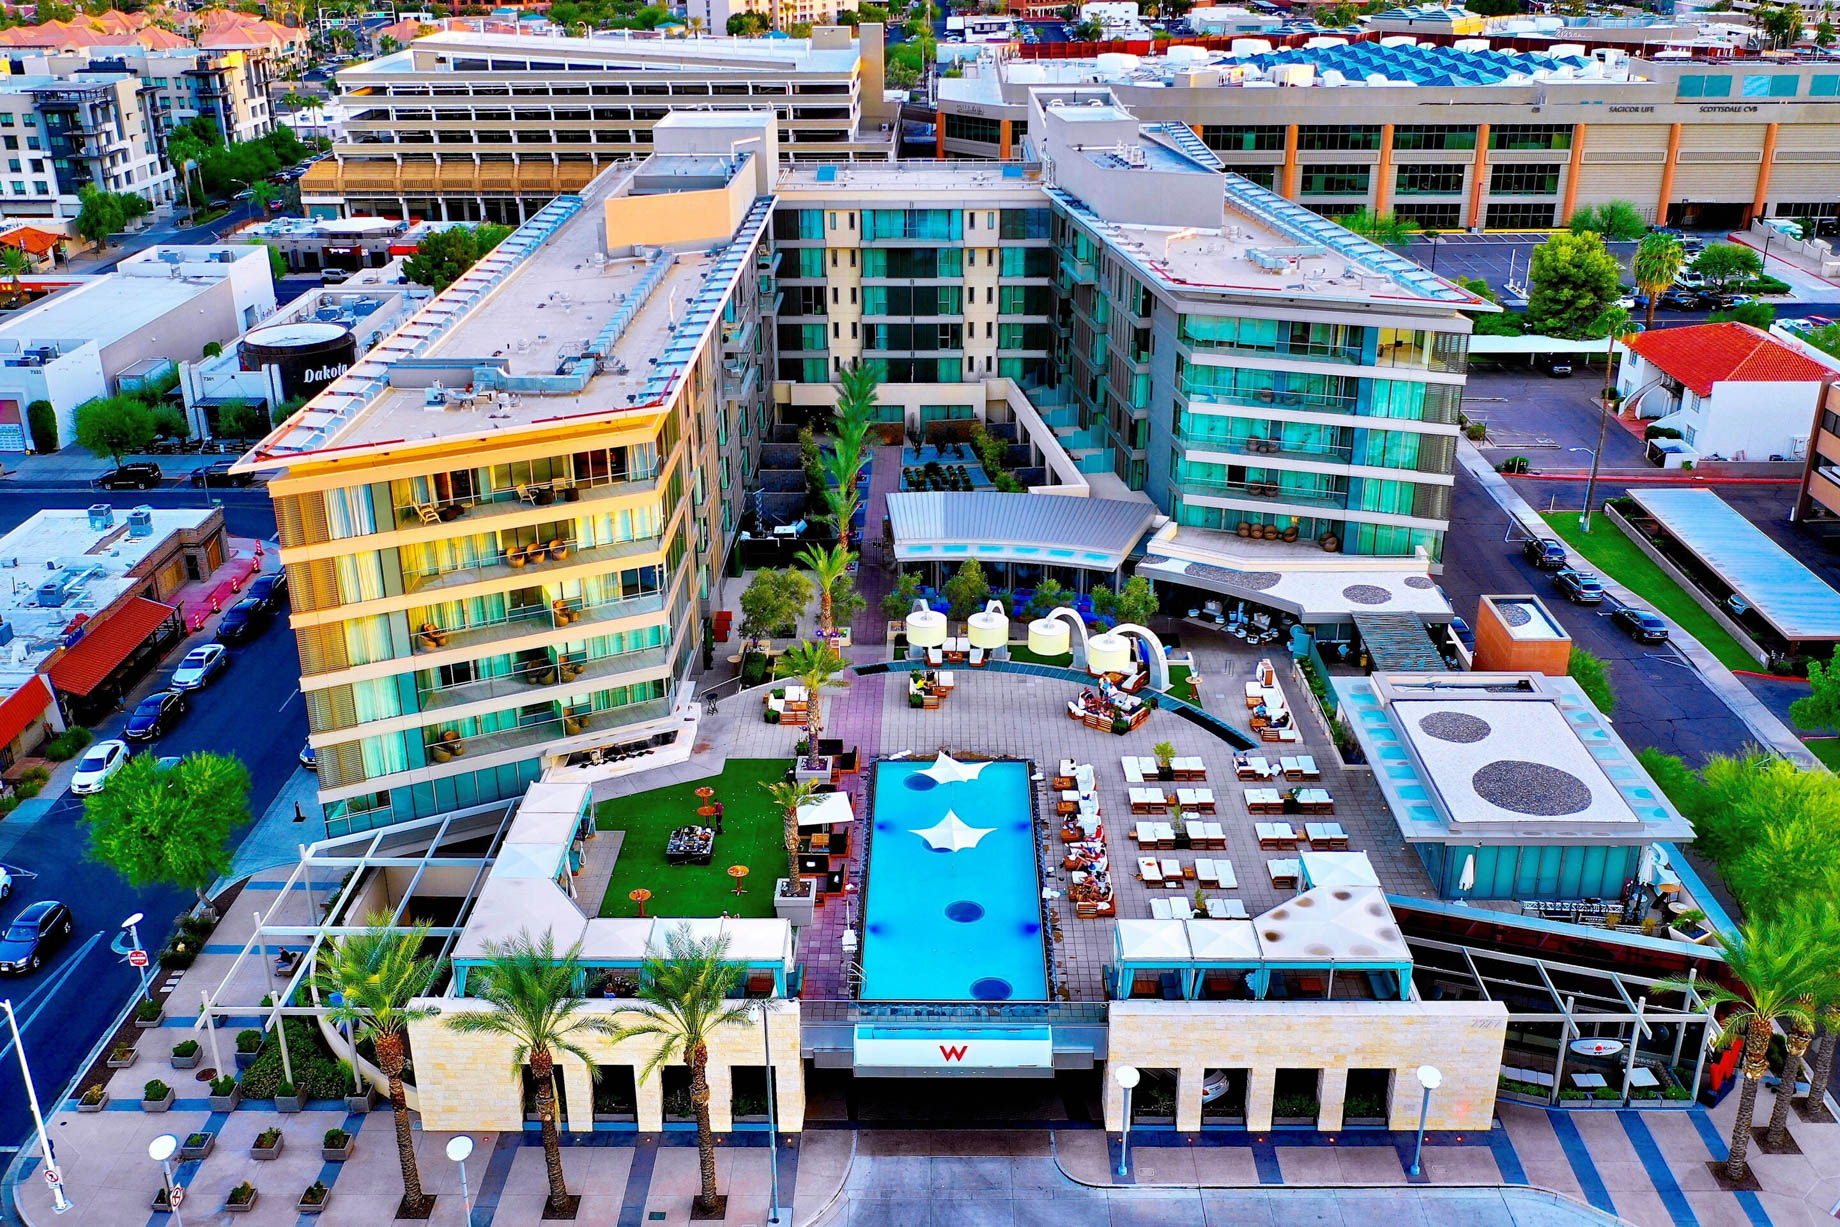 W Scottsdale Luxury Hotel - Scottsdale, AZ, USA - Hotel Exterior